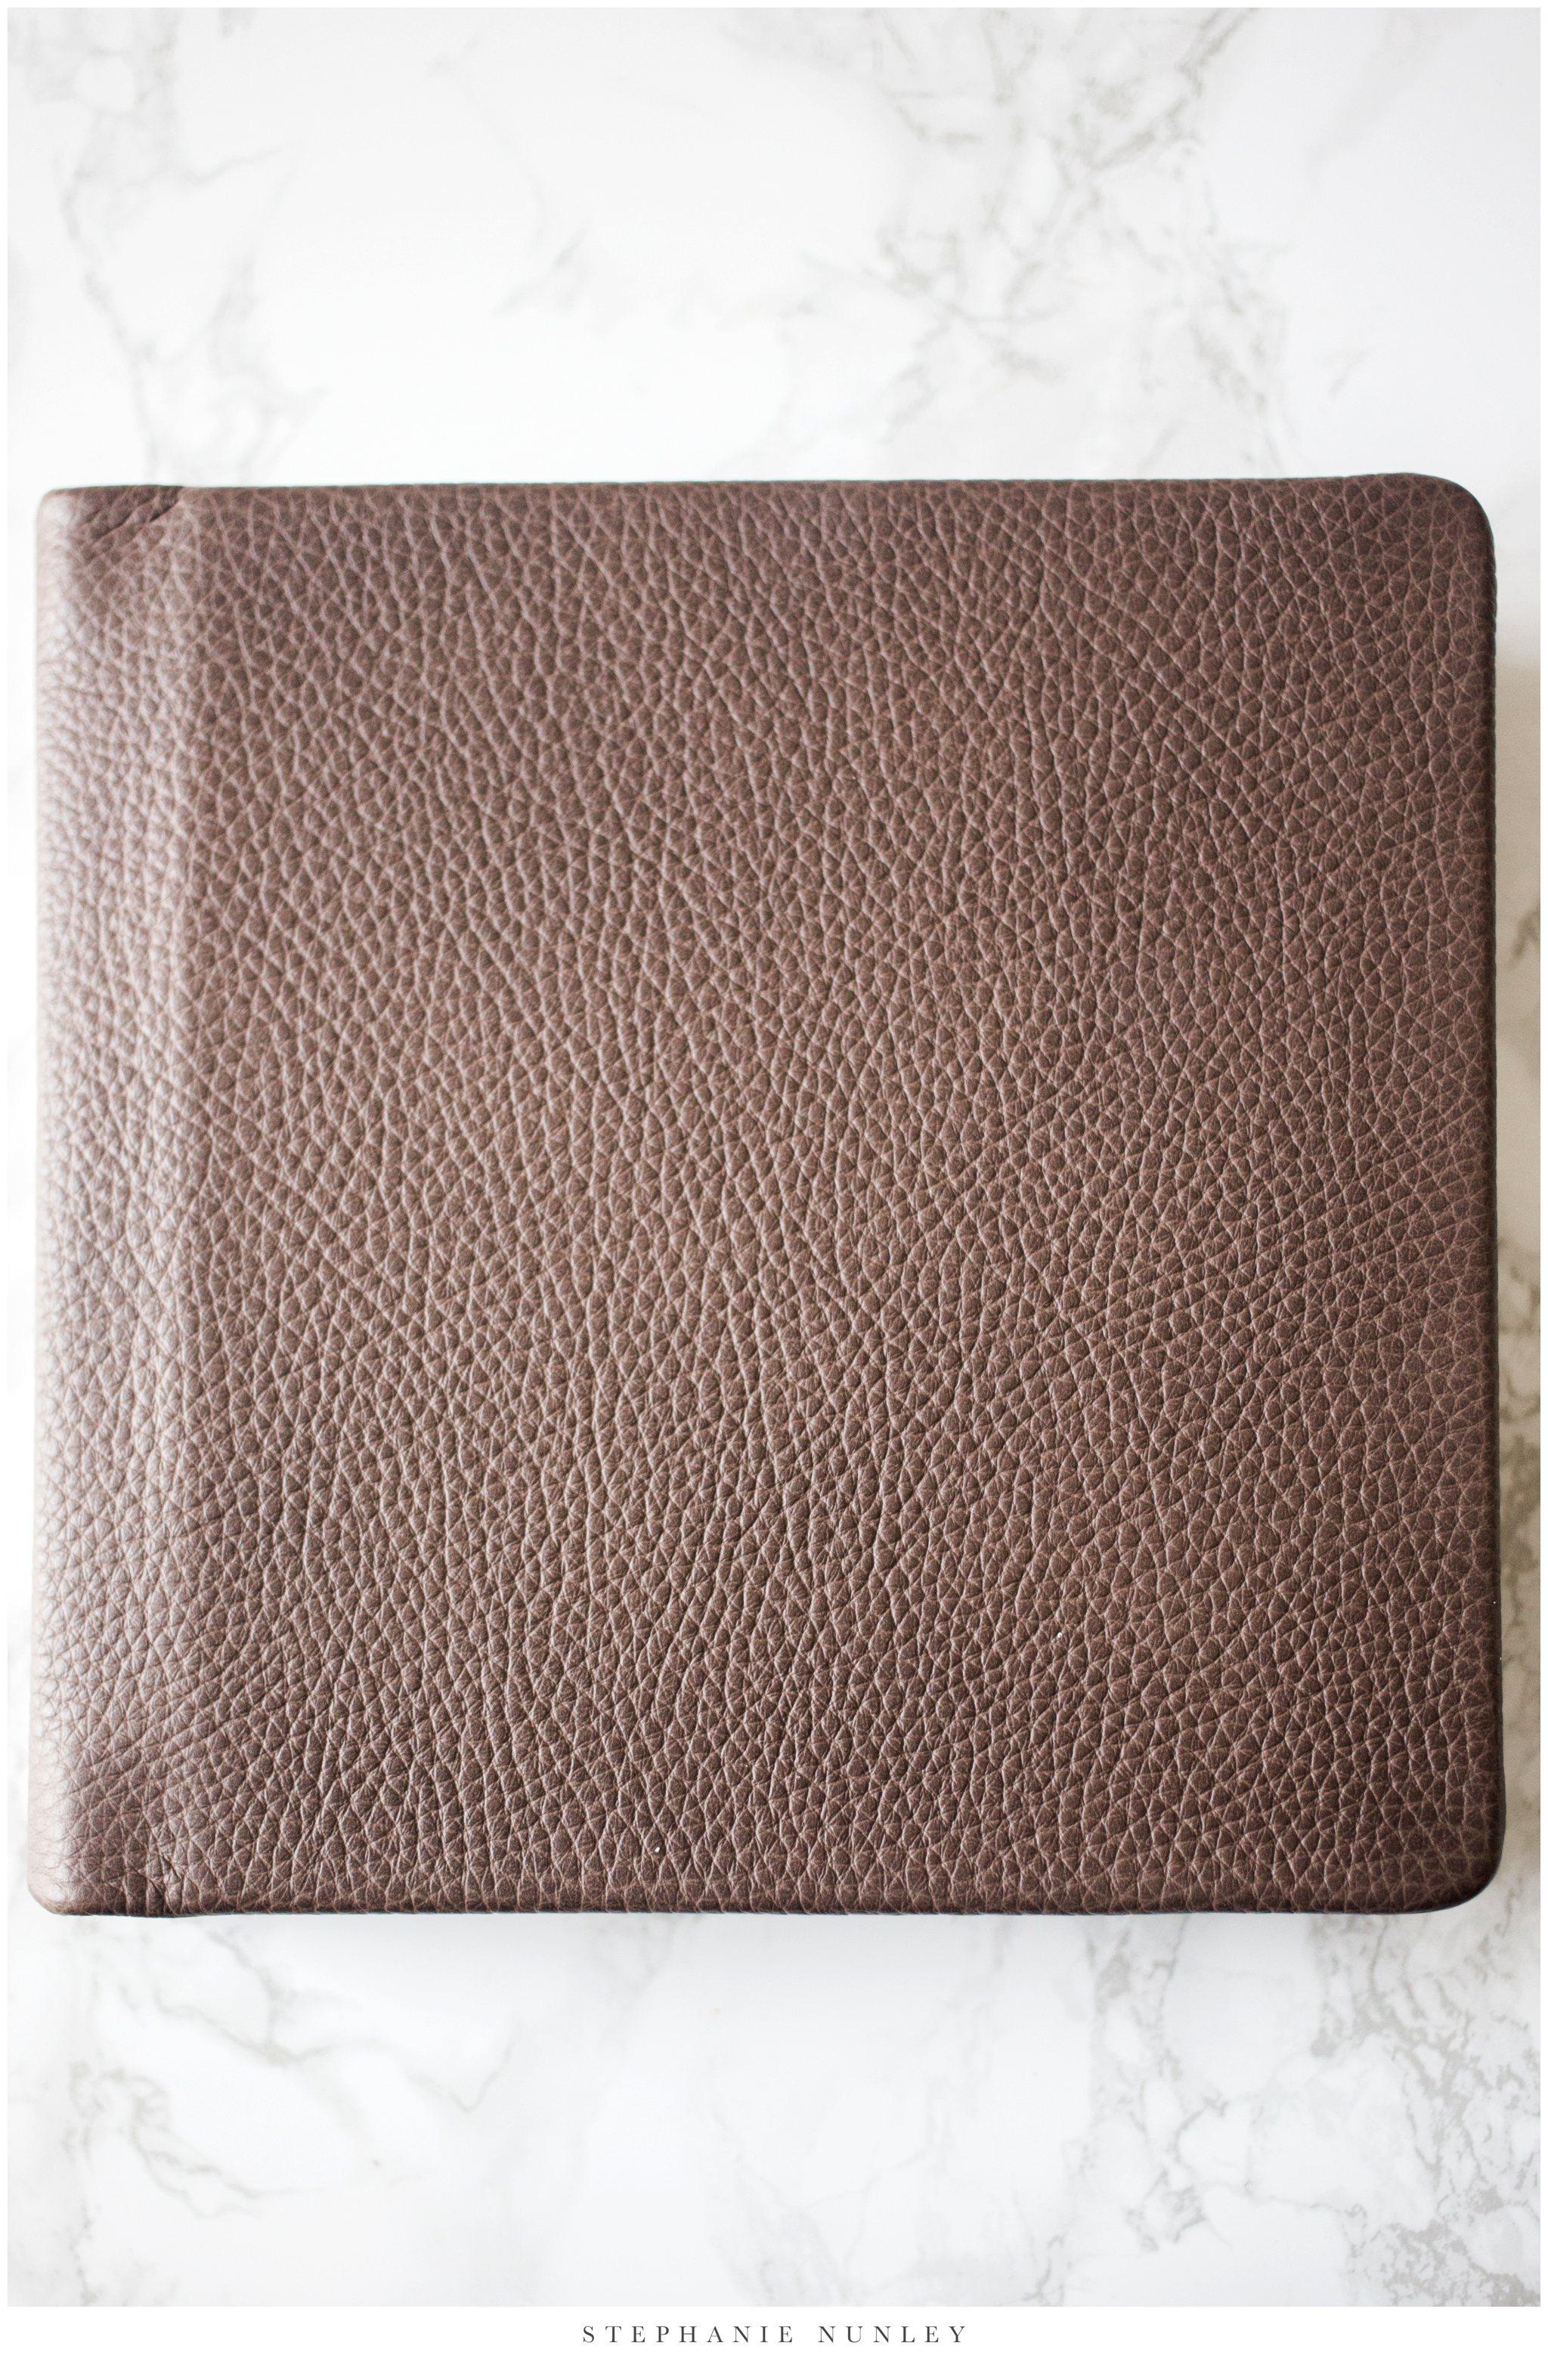 heirloom-leather-wedding-album-0002.jpg